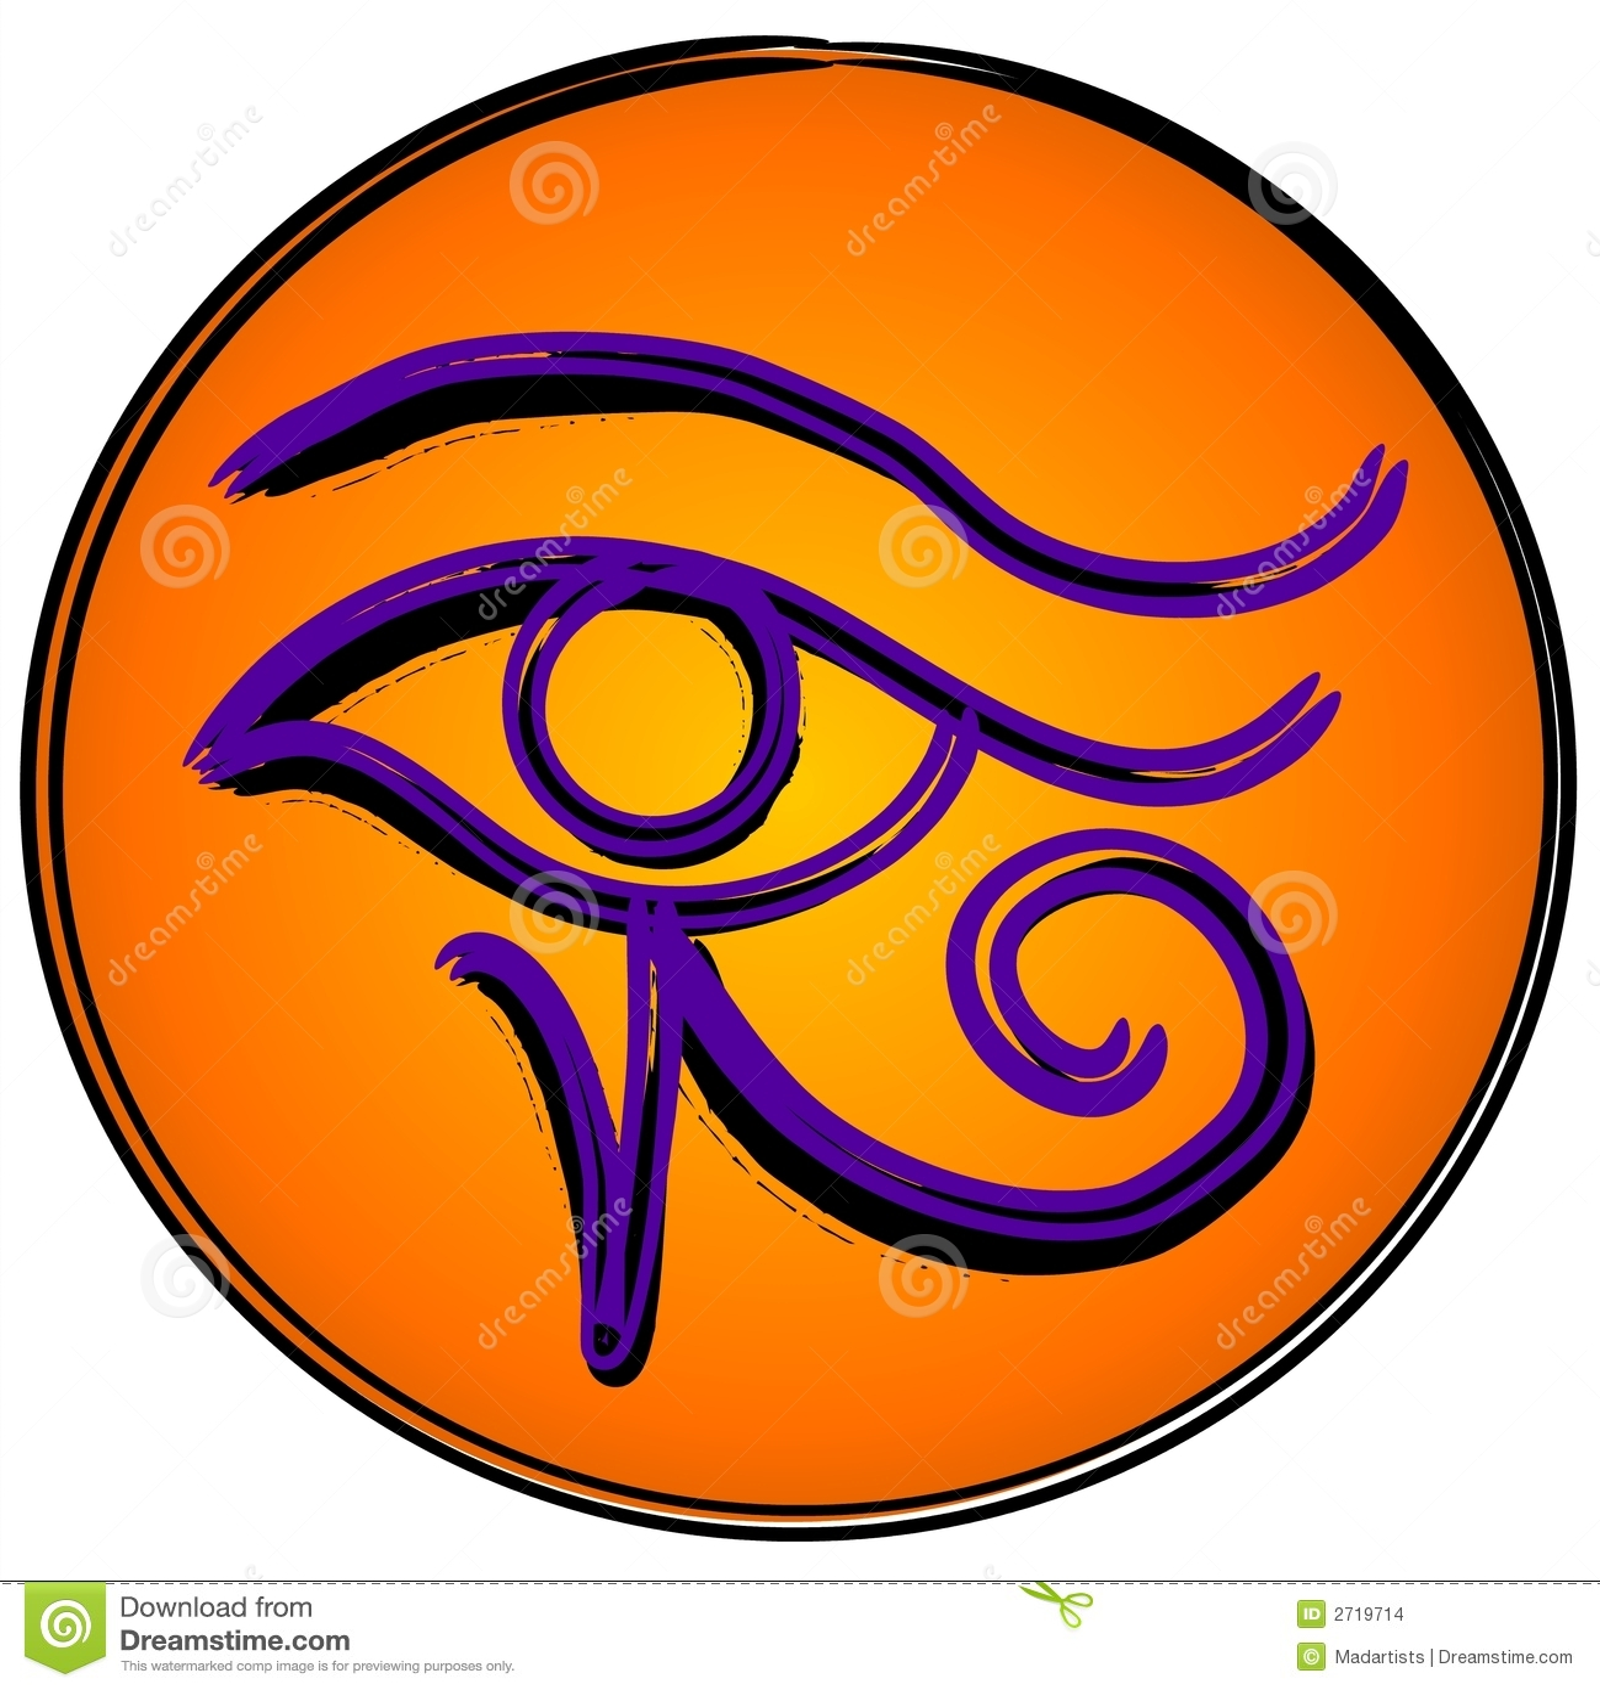 The eye of horus icon symbol stock illustration illustration of the eye of horus icon symbol biocorpaavc Images